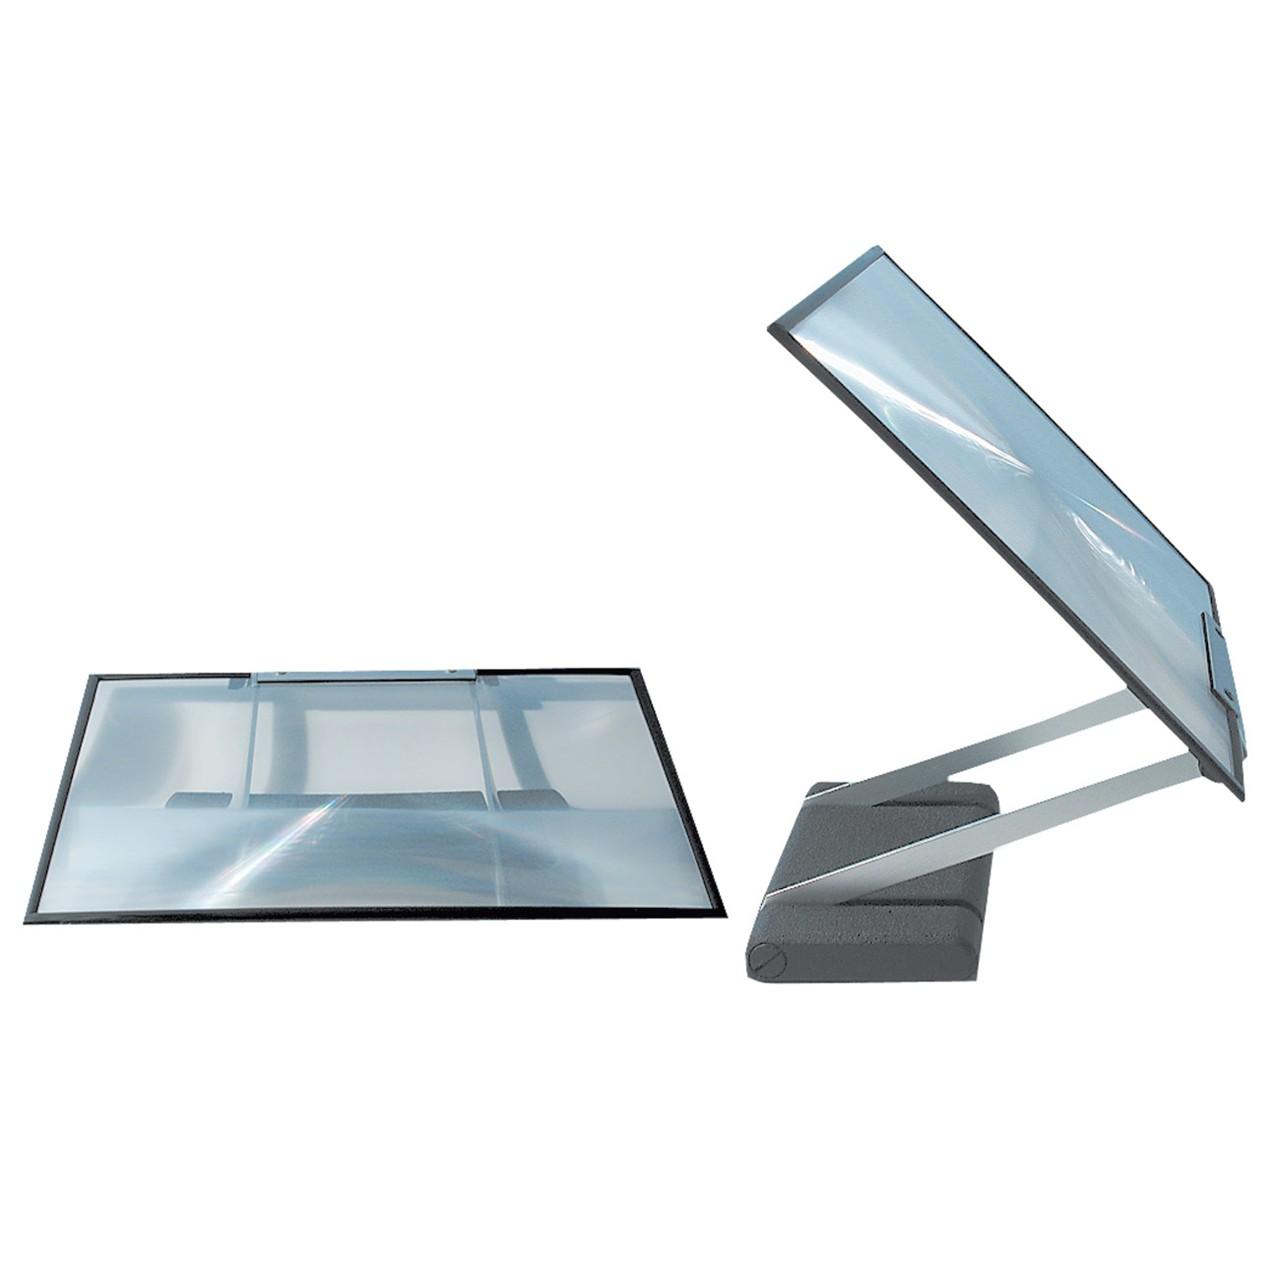 Maxiaids Reizen Fresnel Computer Stand Magnifier